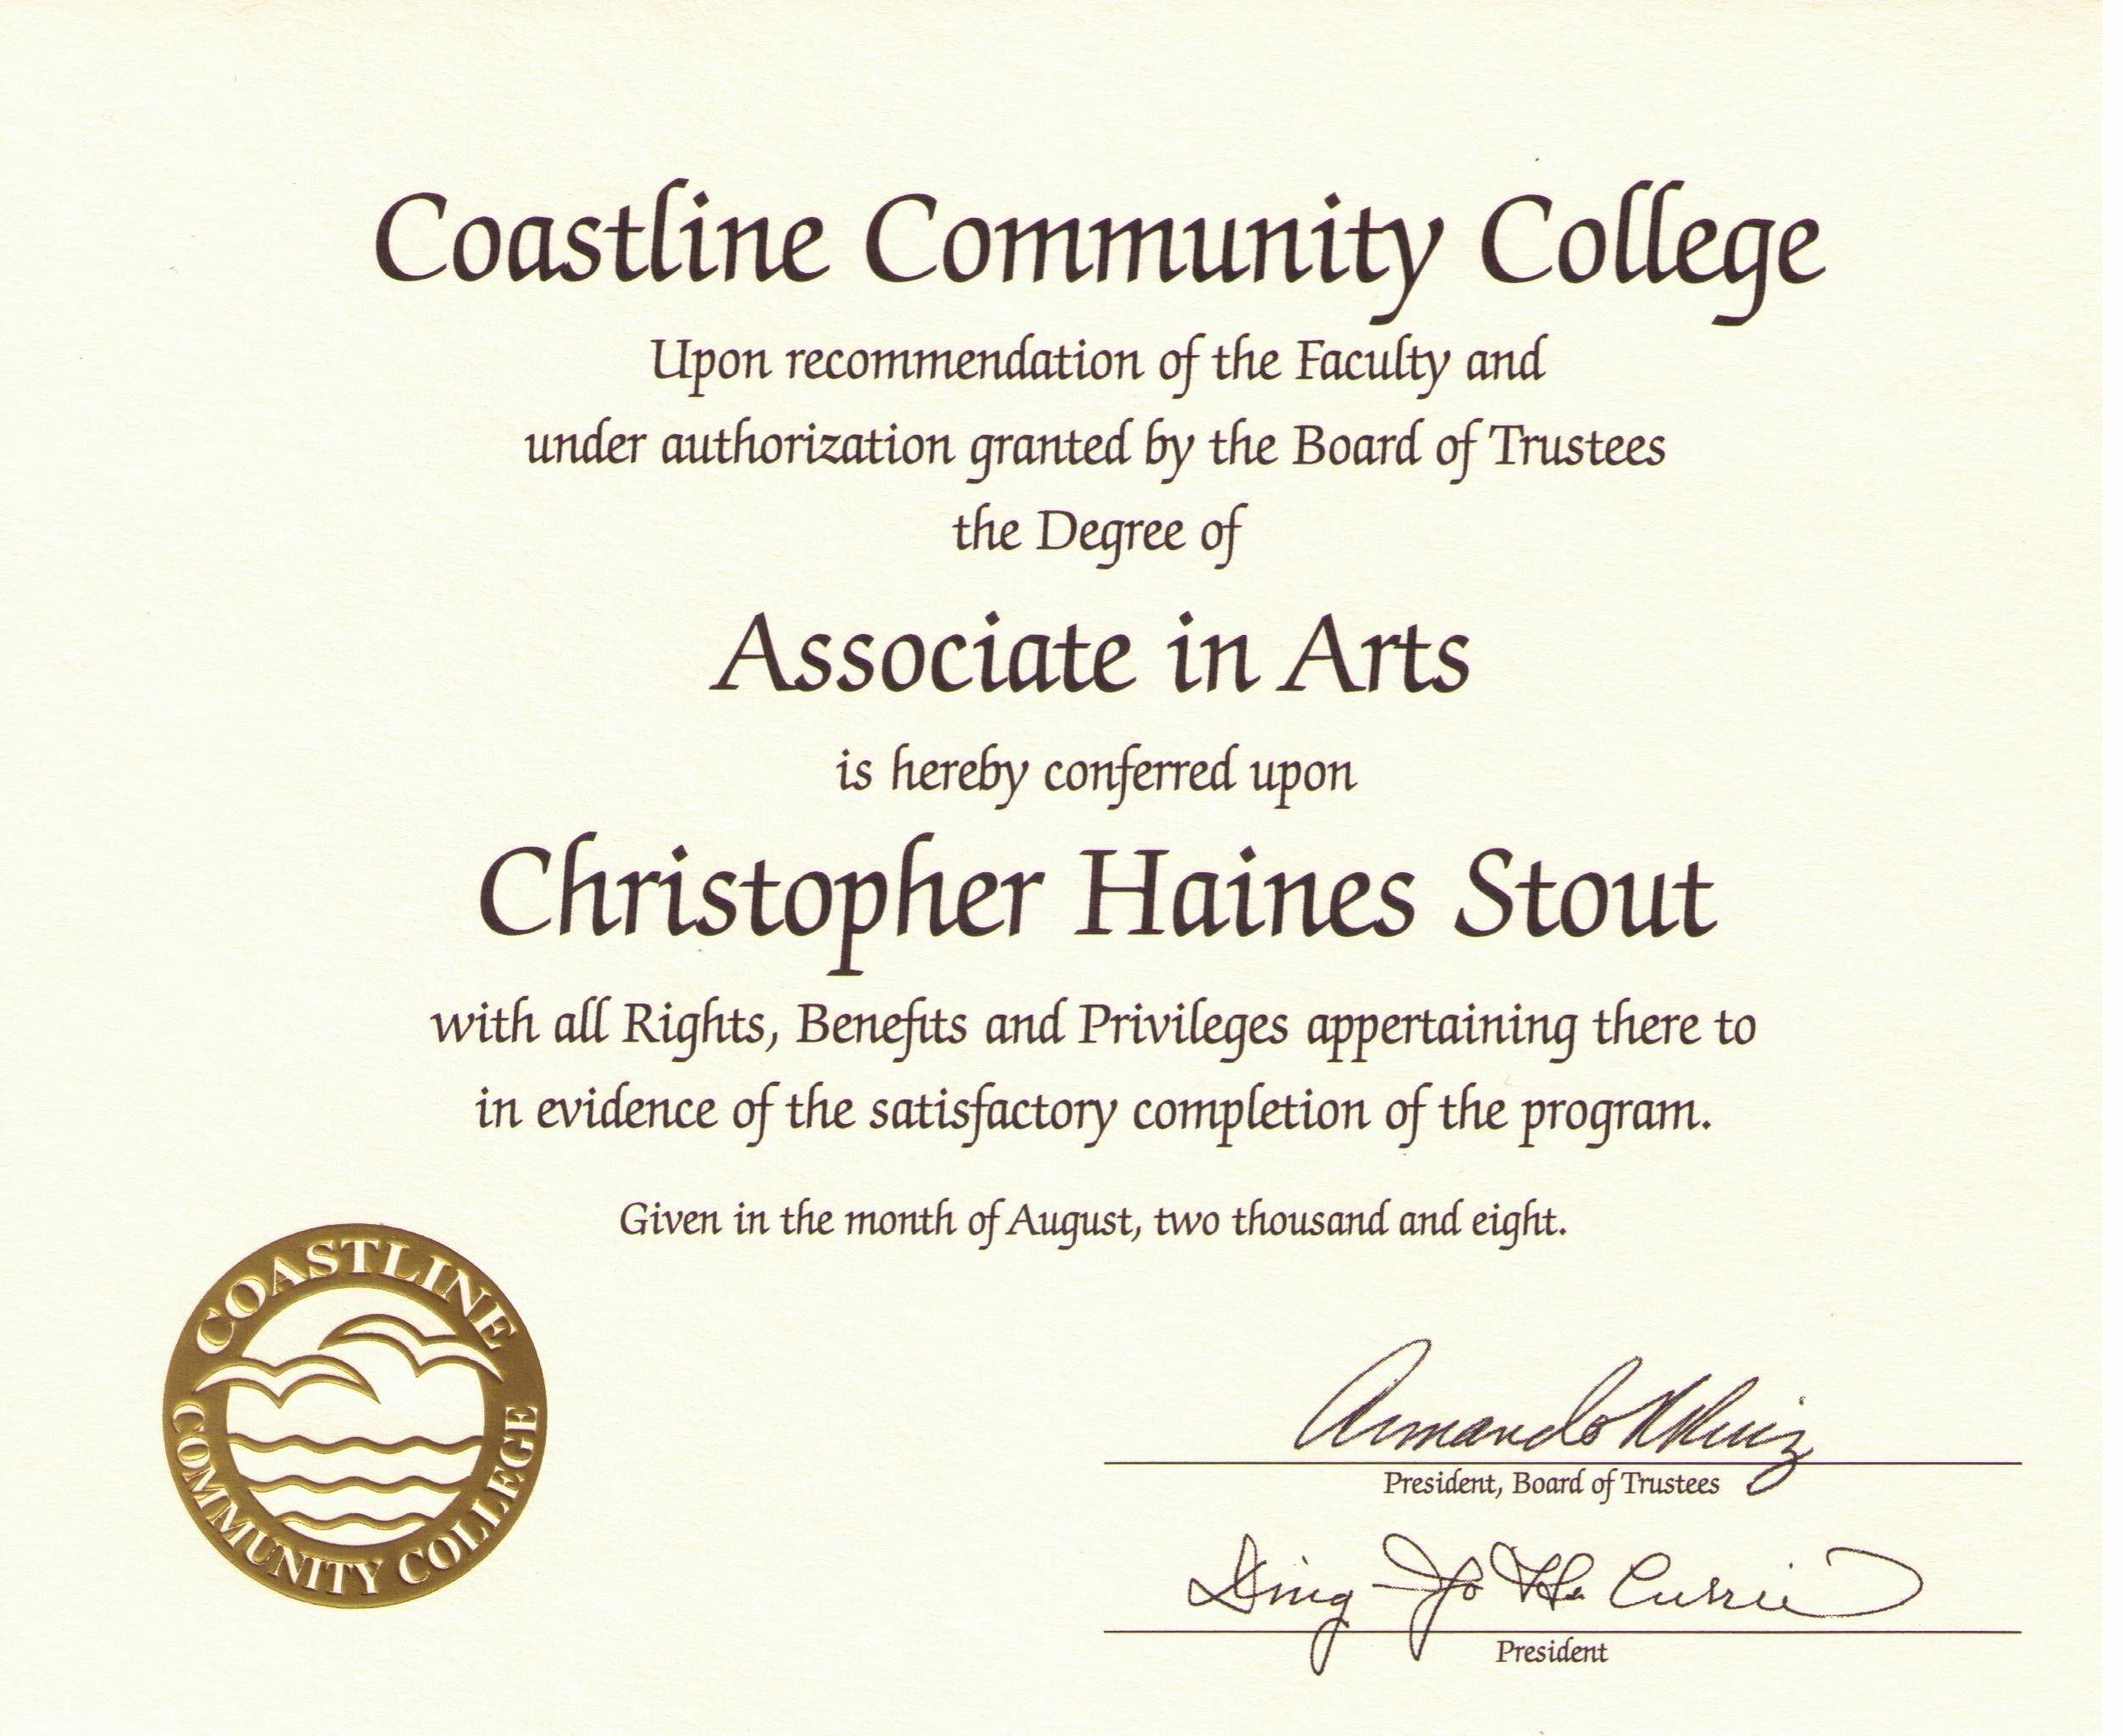 Free Printable College Diploma | Fake Diploma, Fake Degrees Or - Printable Fake Ged Certificate For Free